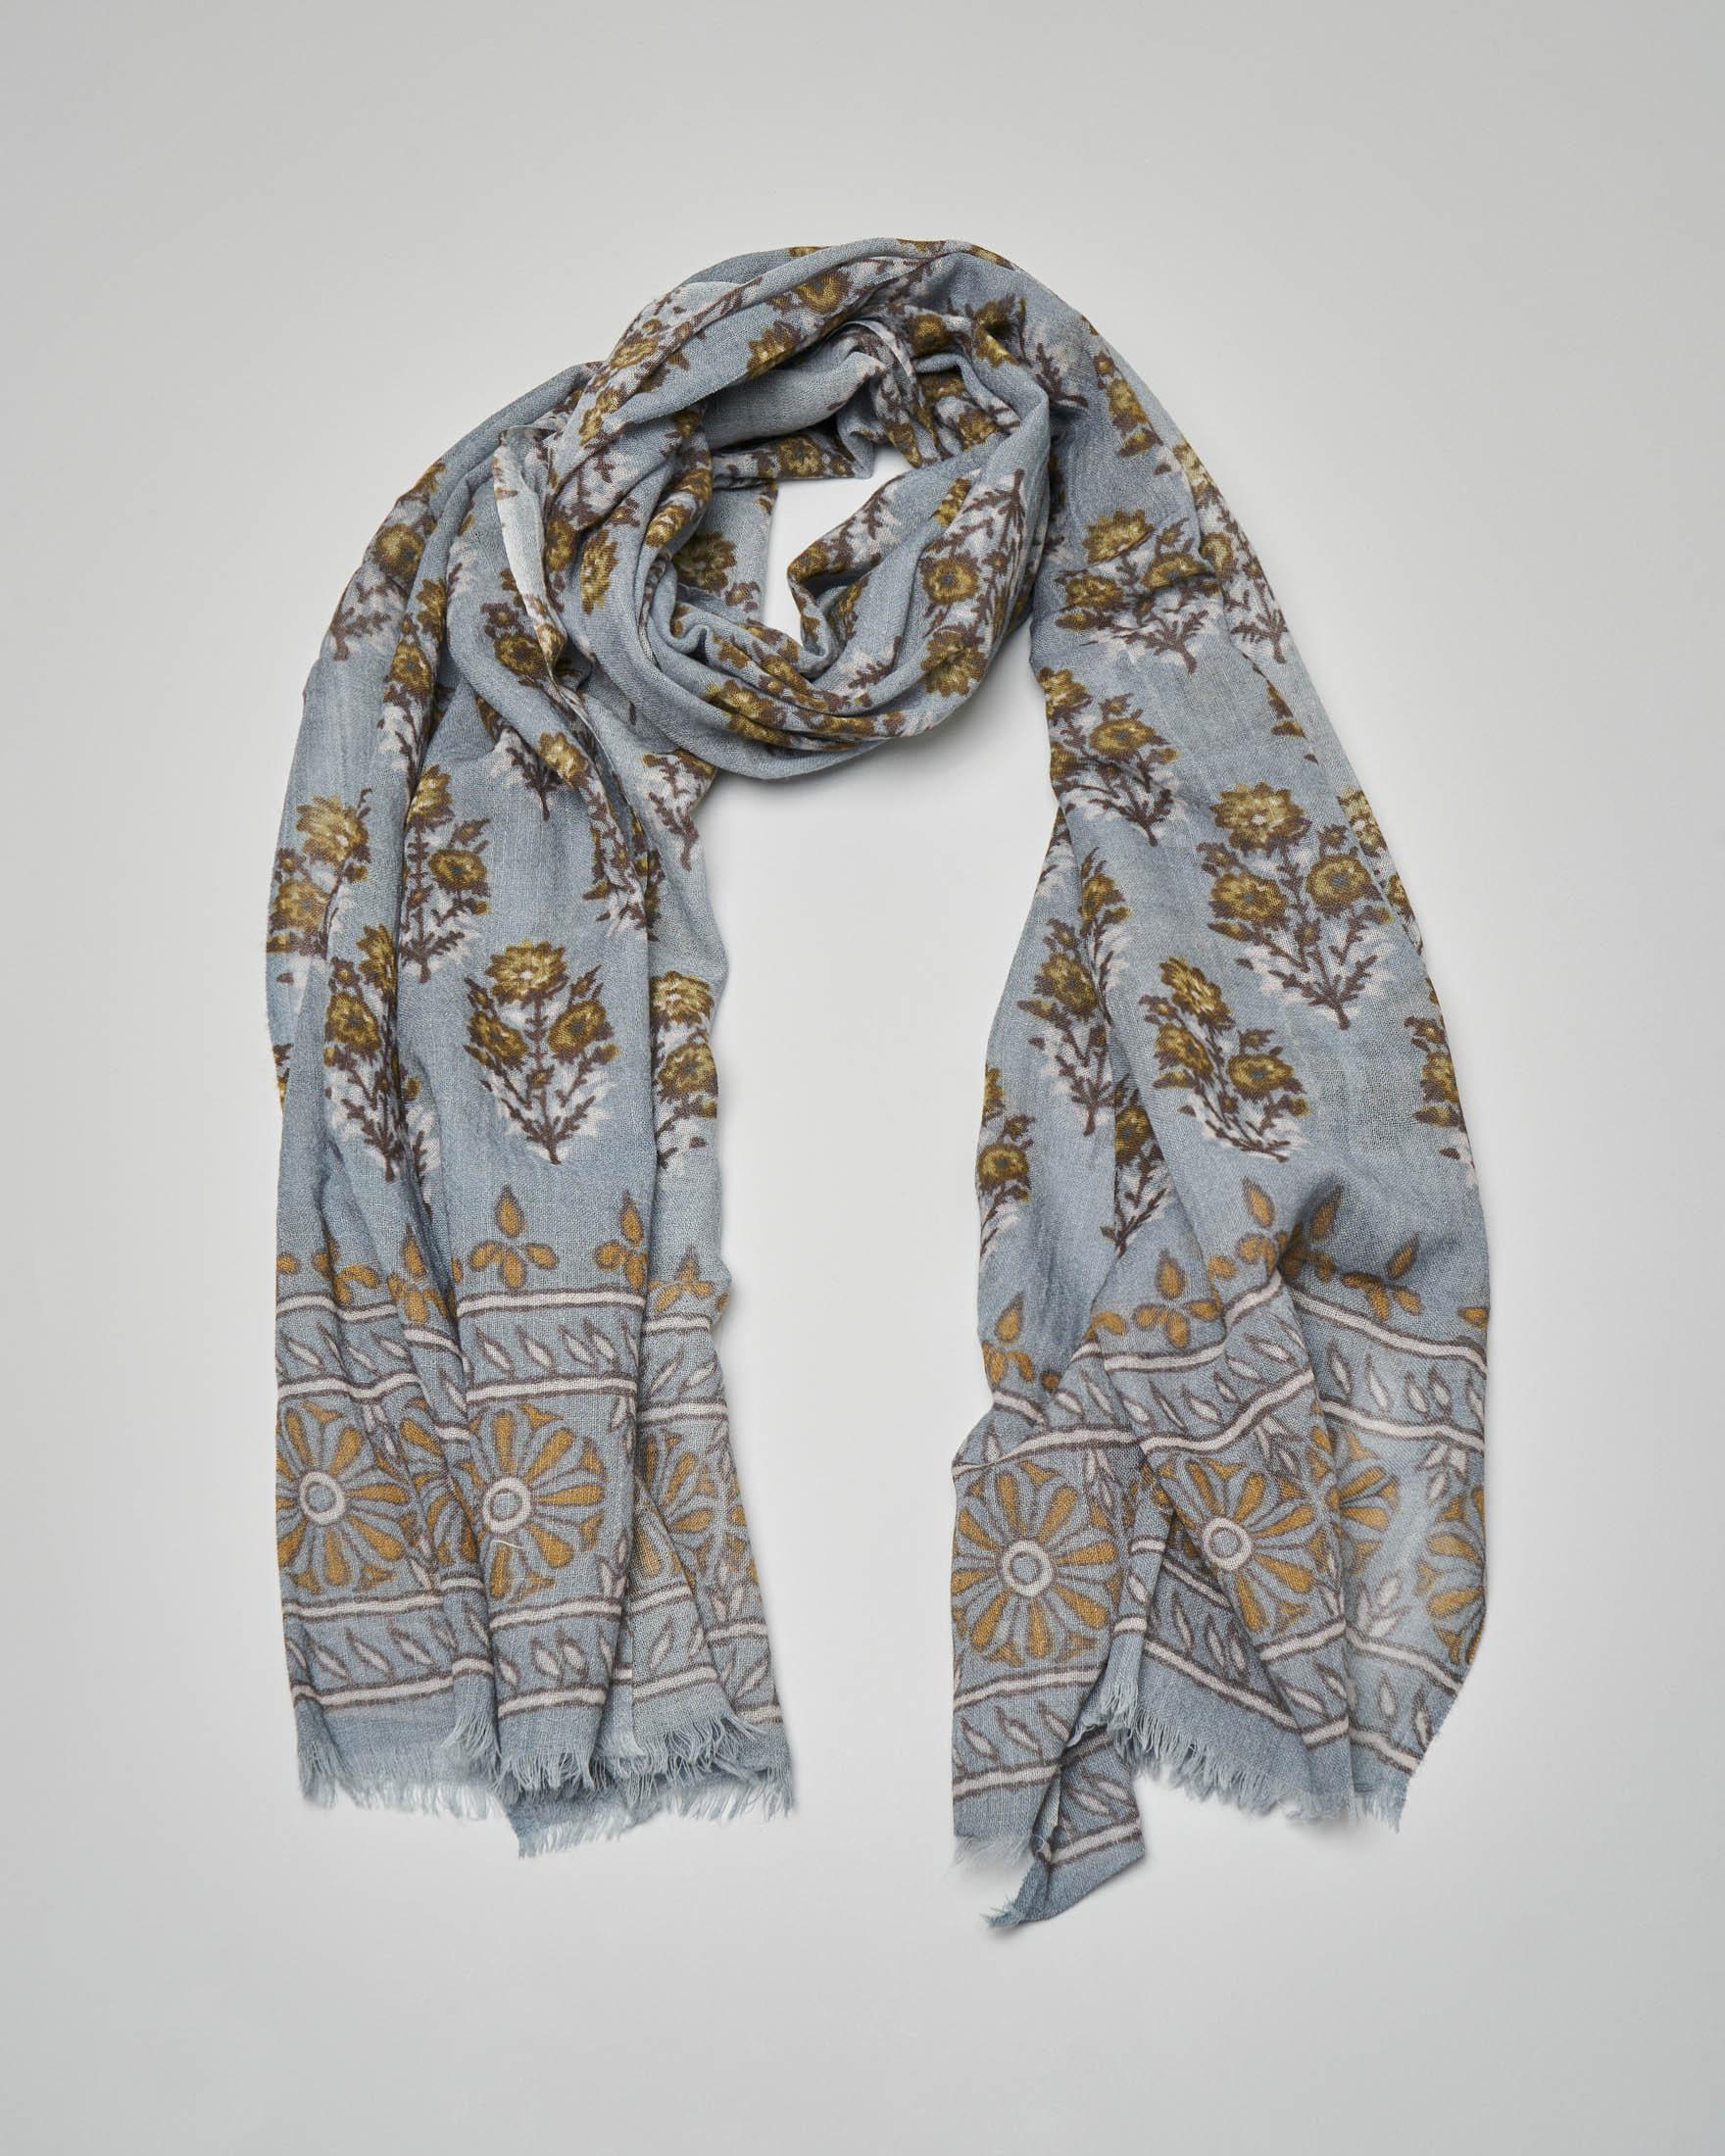 Sciarpa in lana azzurra a fantasia fleurage color lime e fondo a contrasto